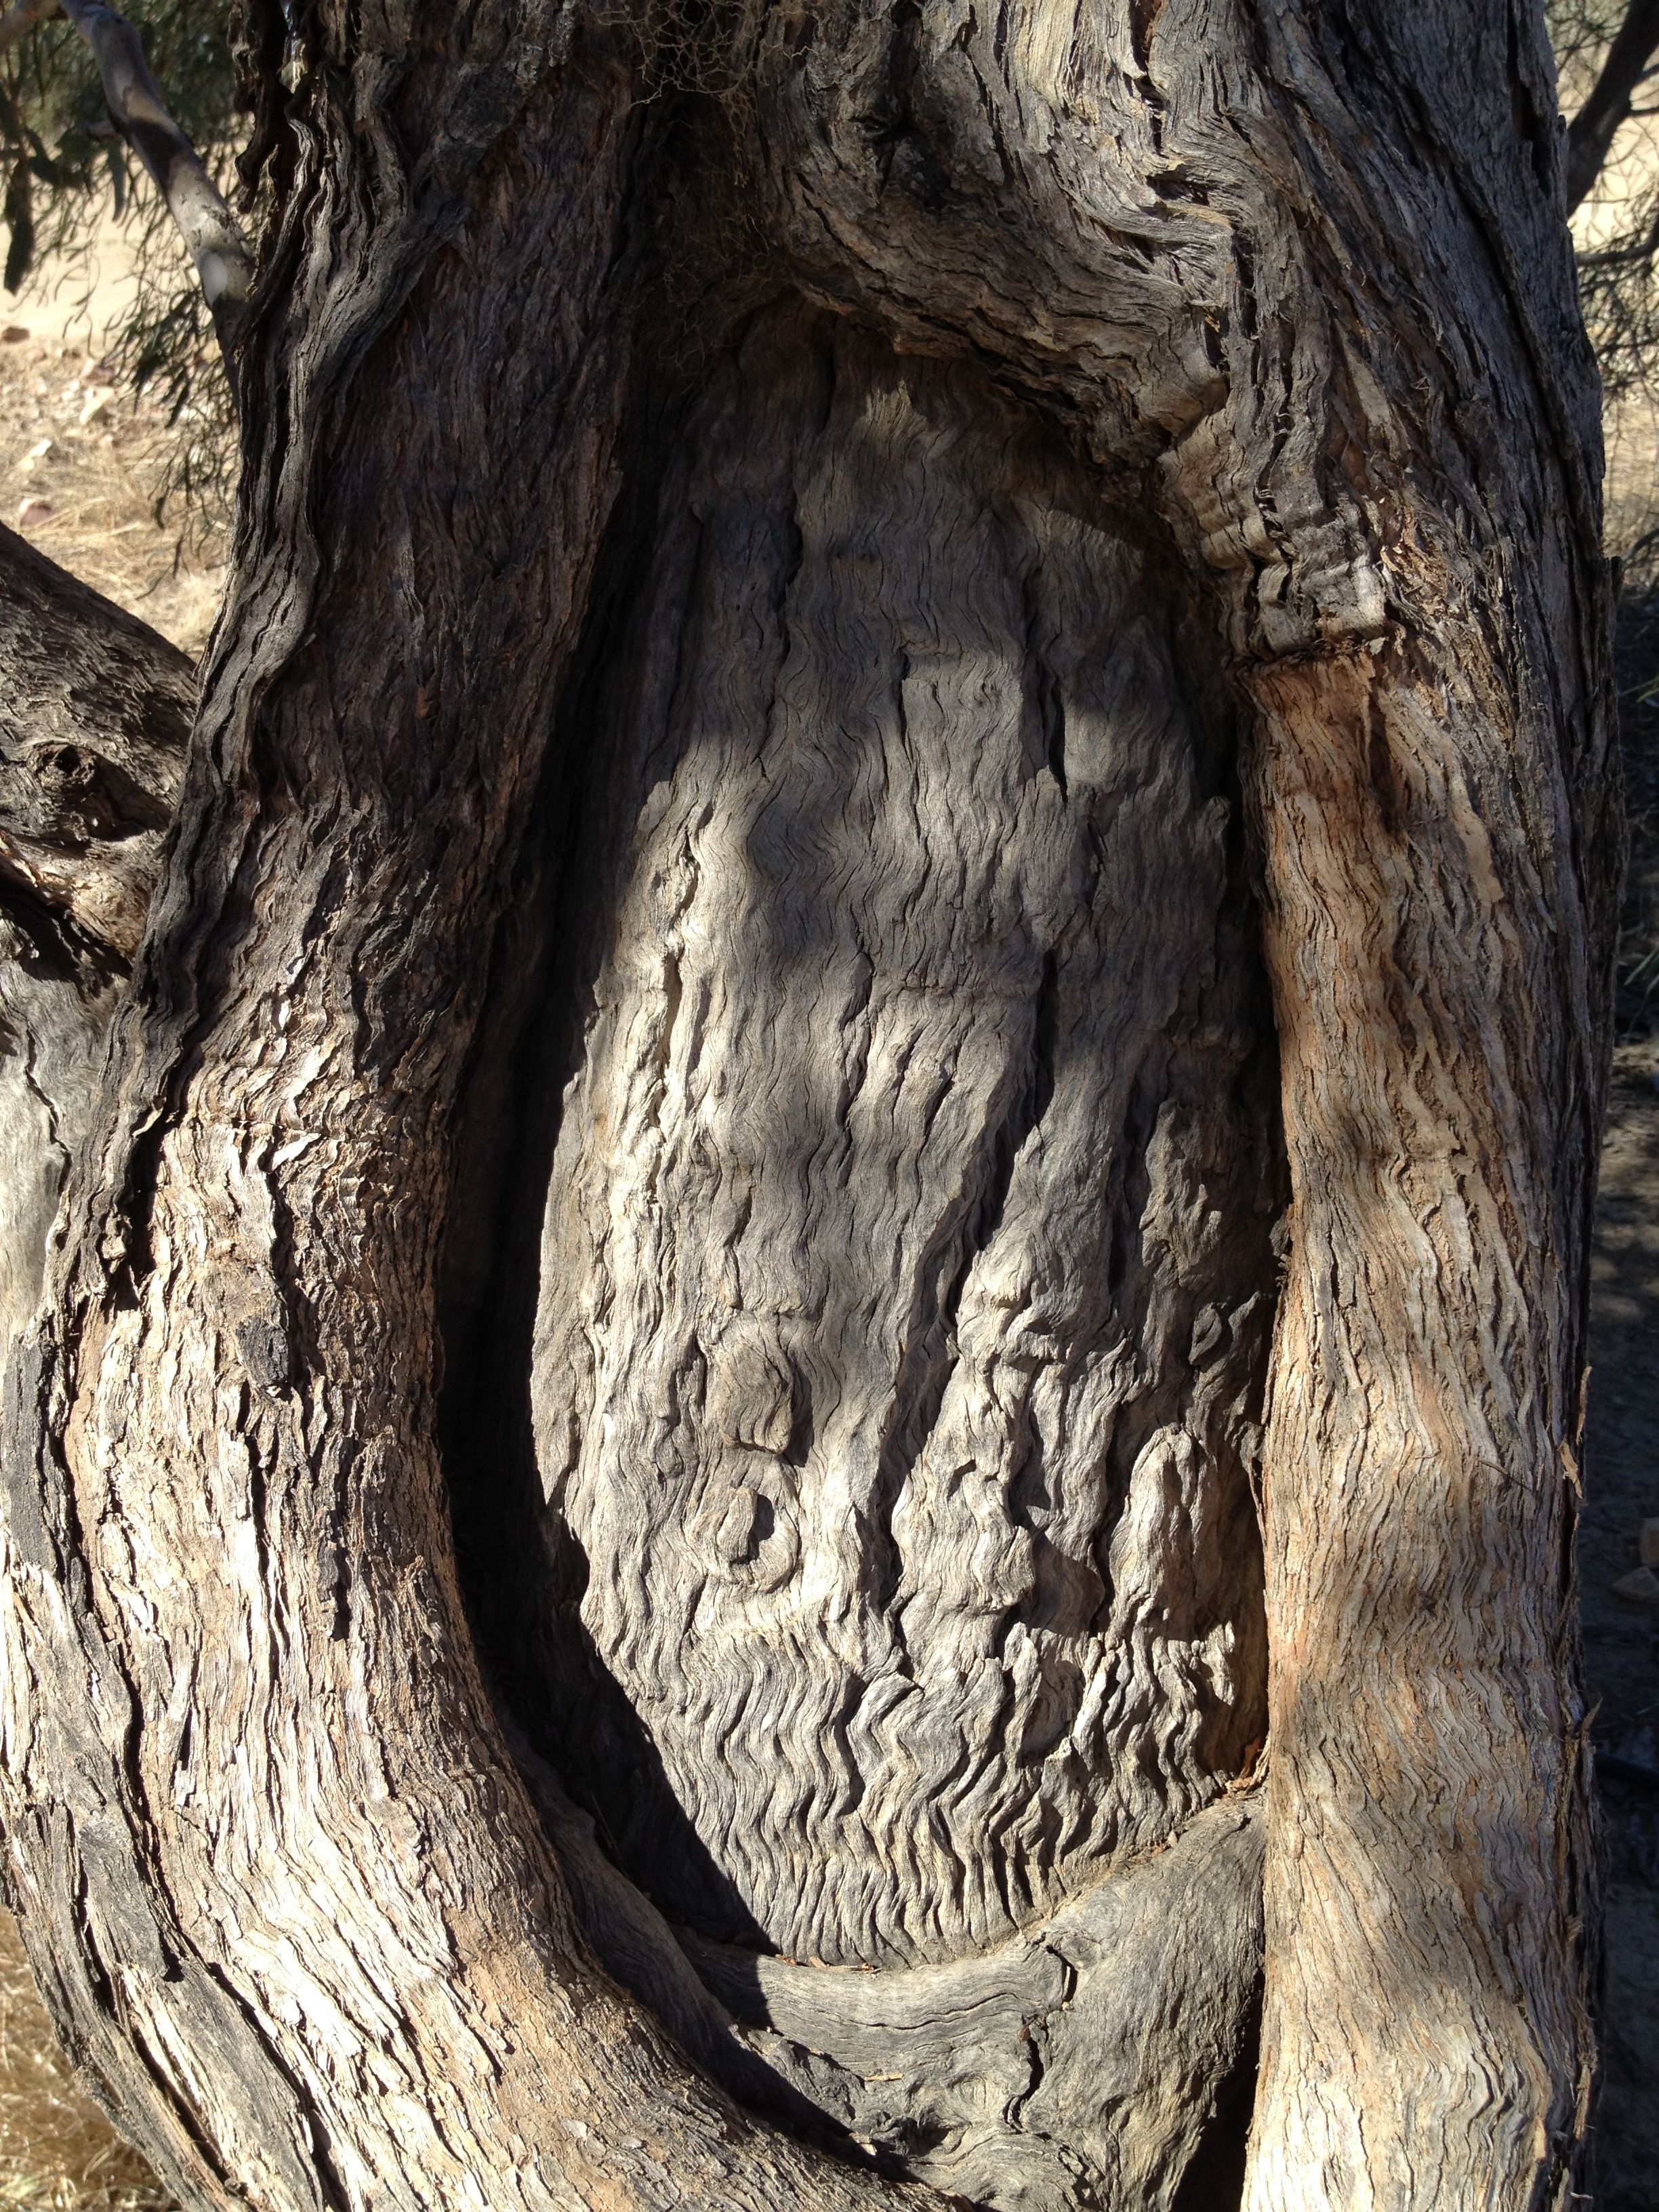 Burke & Wills initials in the tree Brisbane to